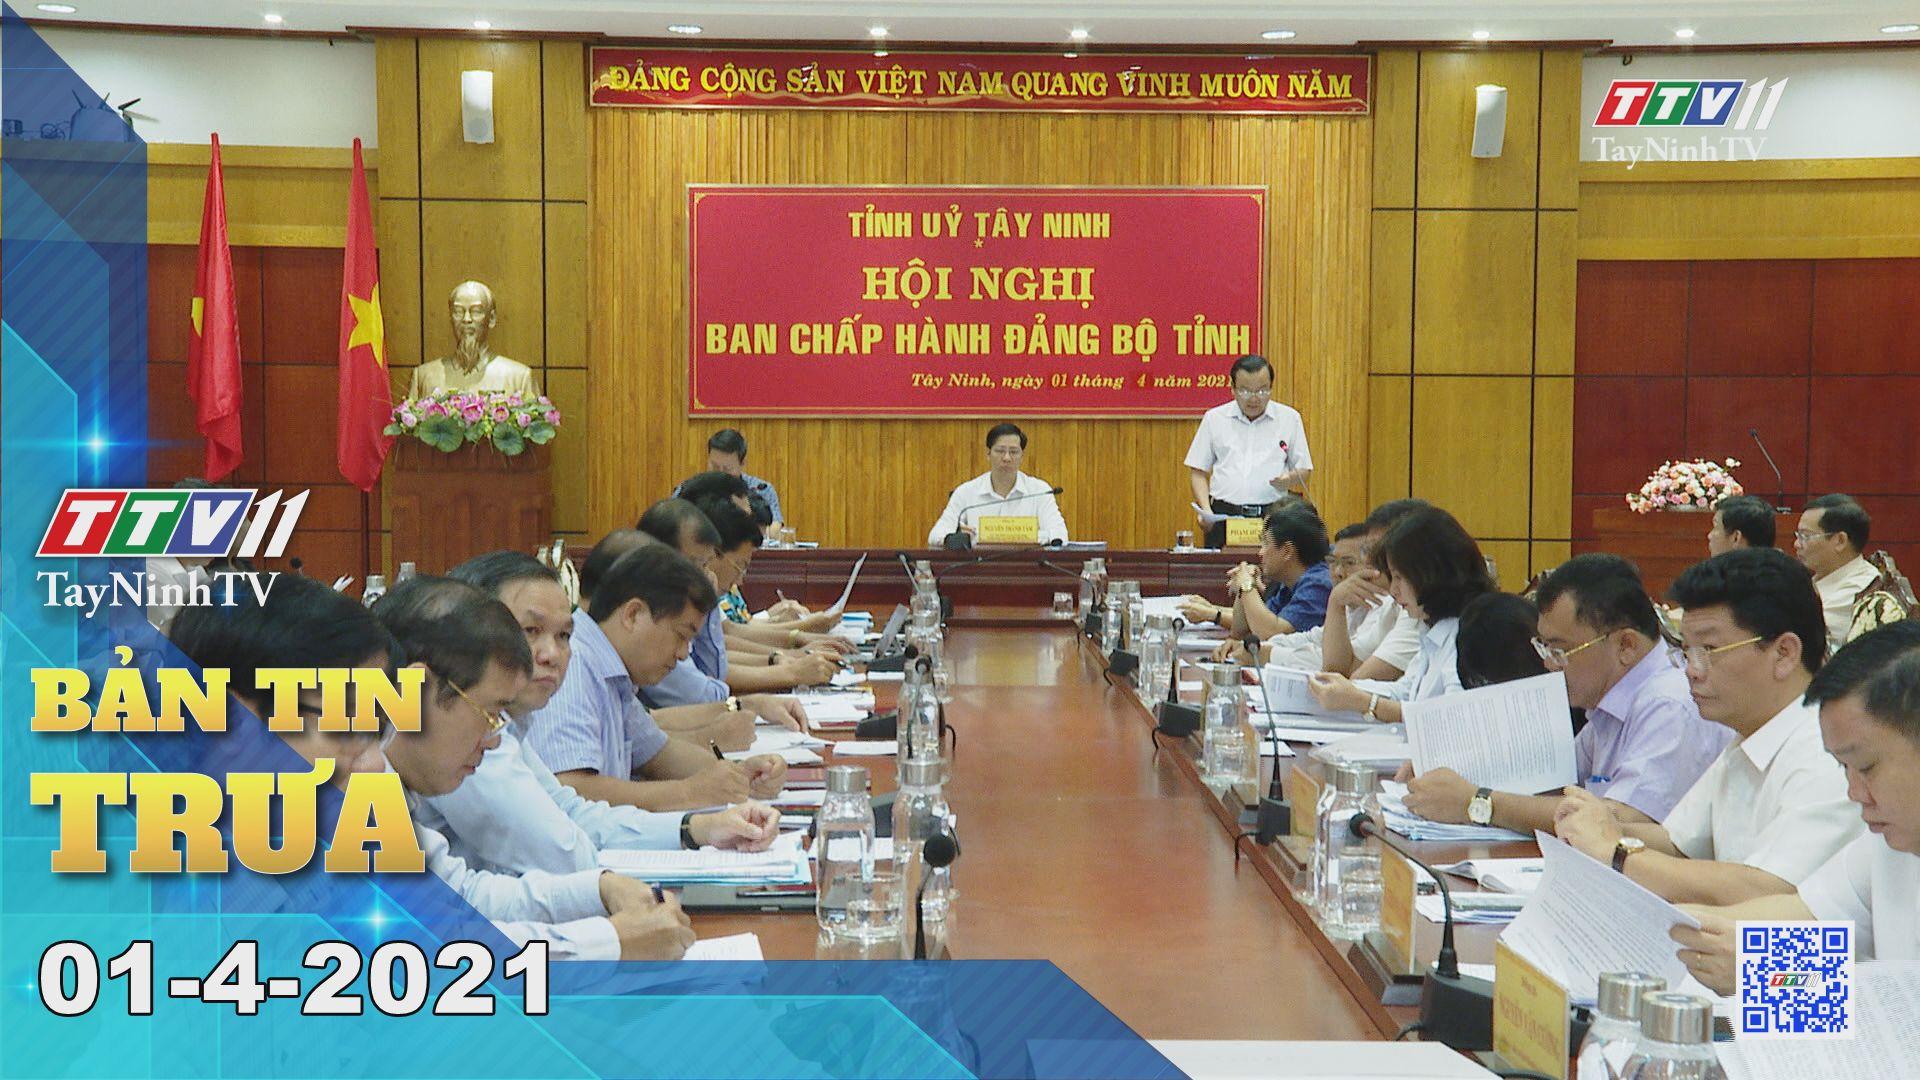 Bản tin trưa 01-4-2021 | Tin tức hôm nay | TayNinhTV